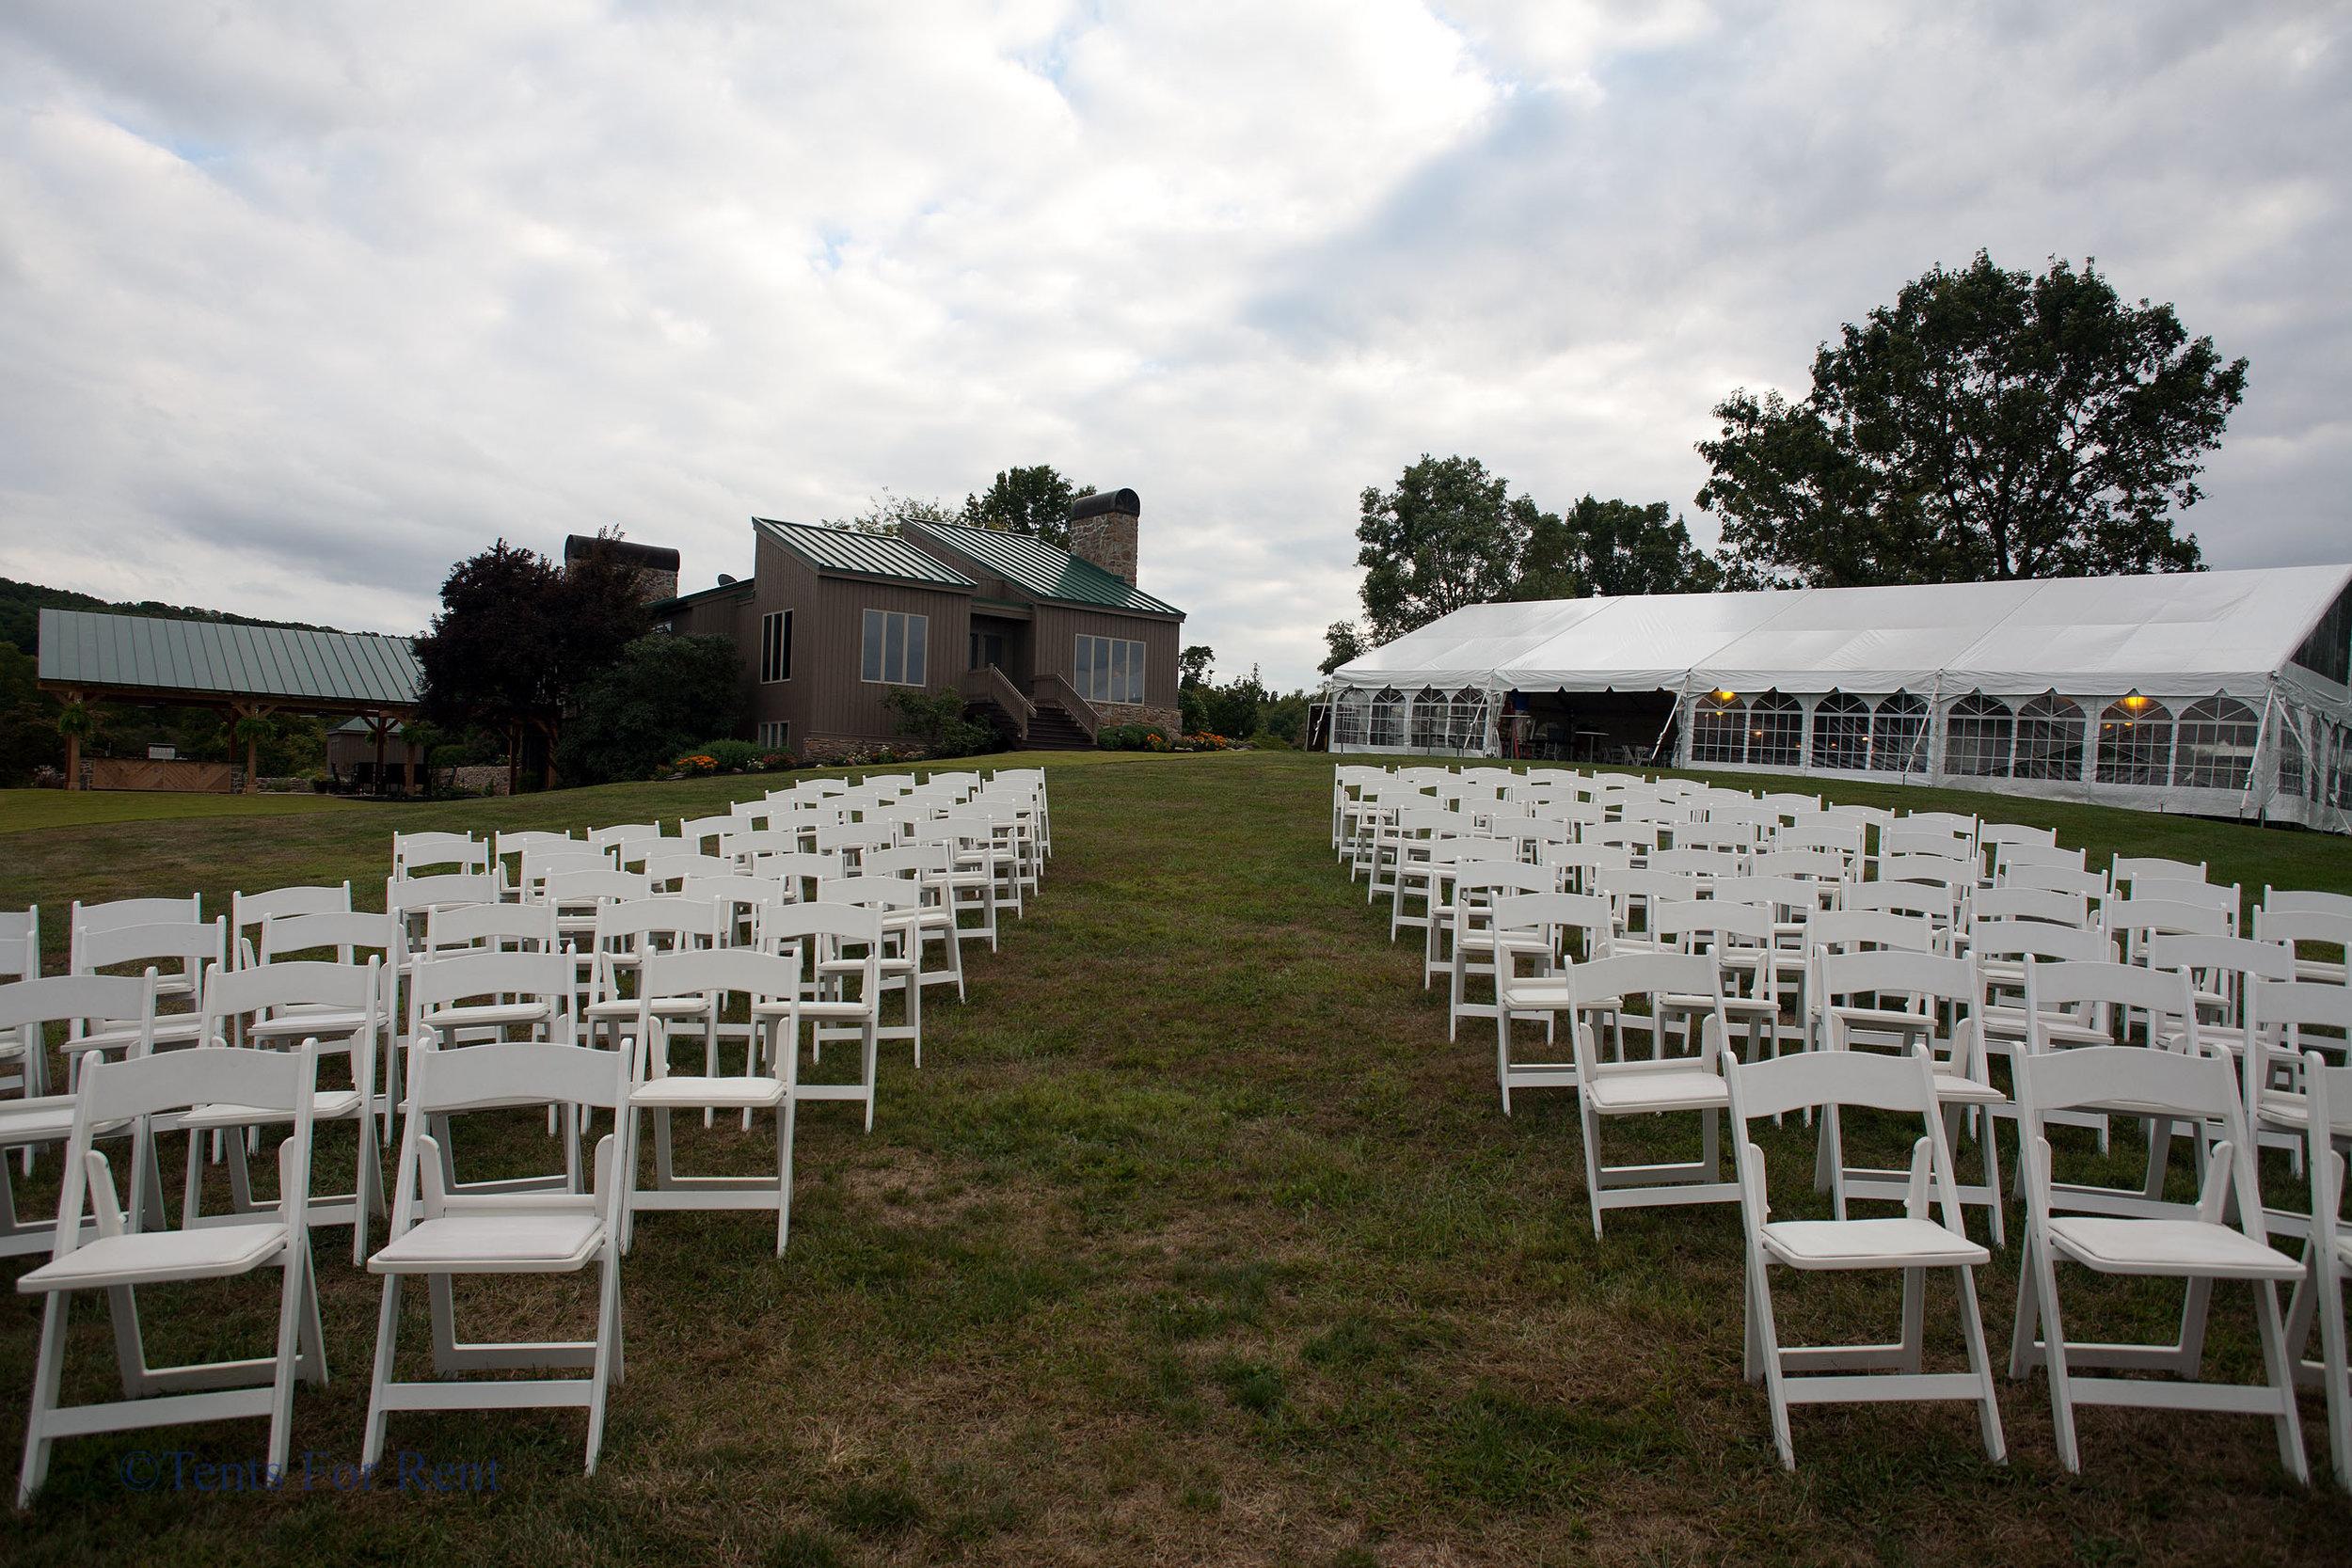 Chair rentals in Norristown